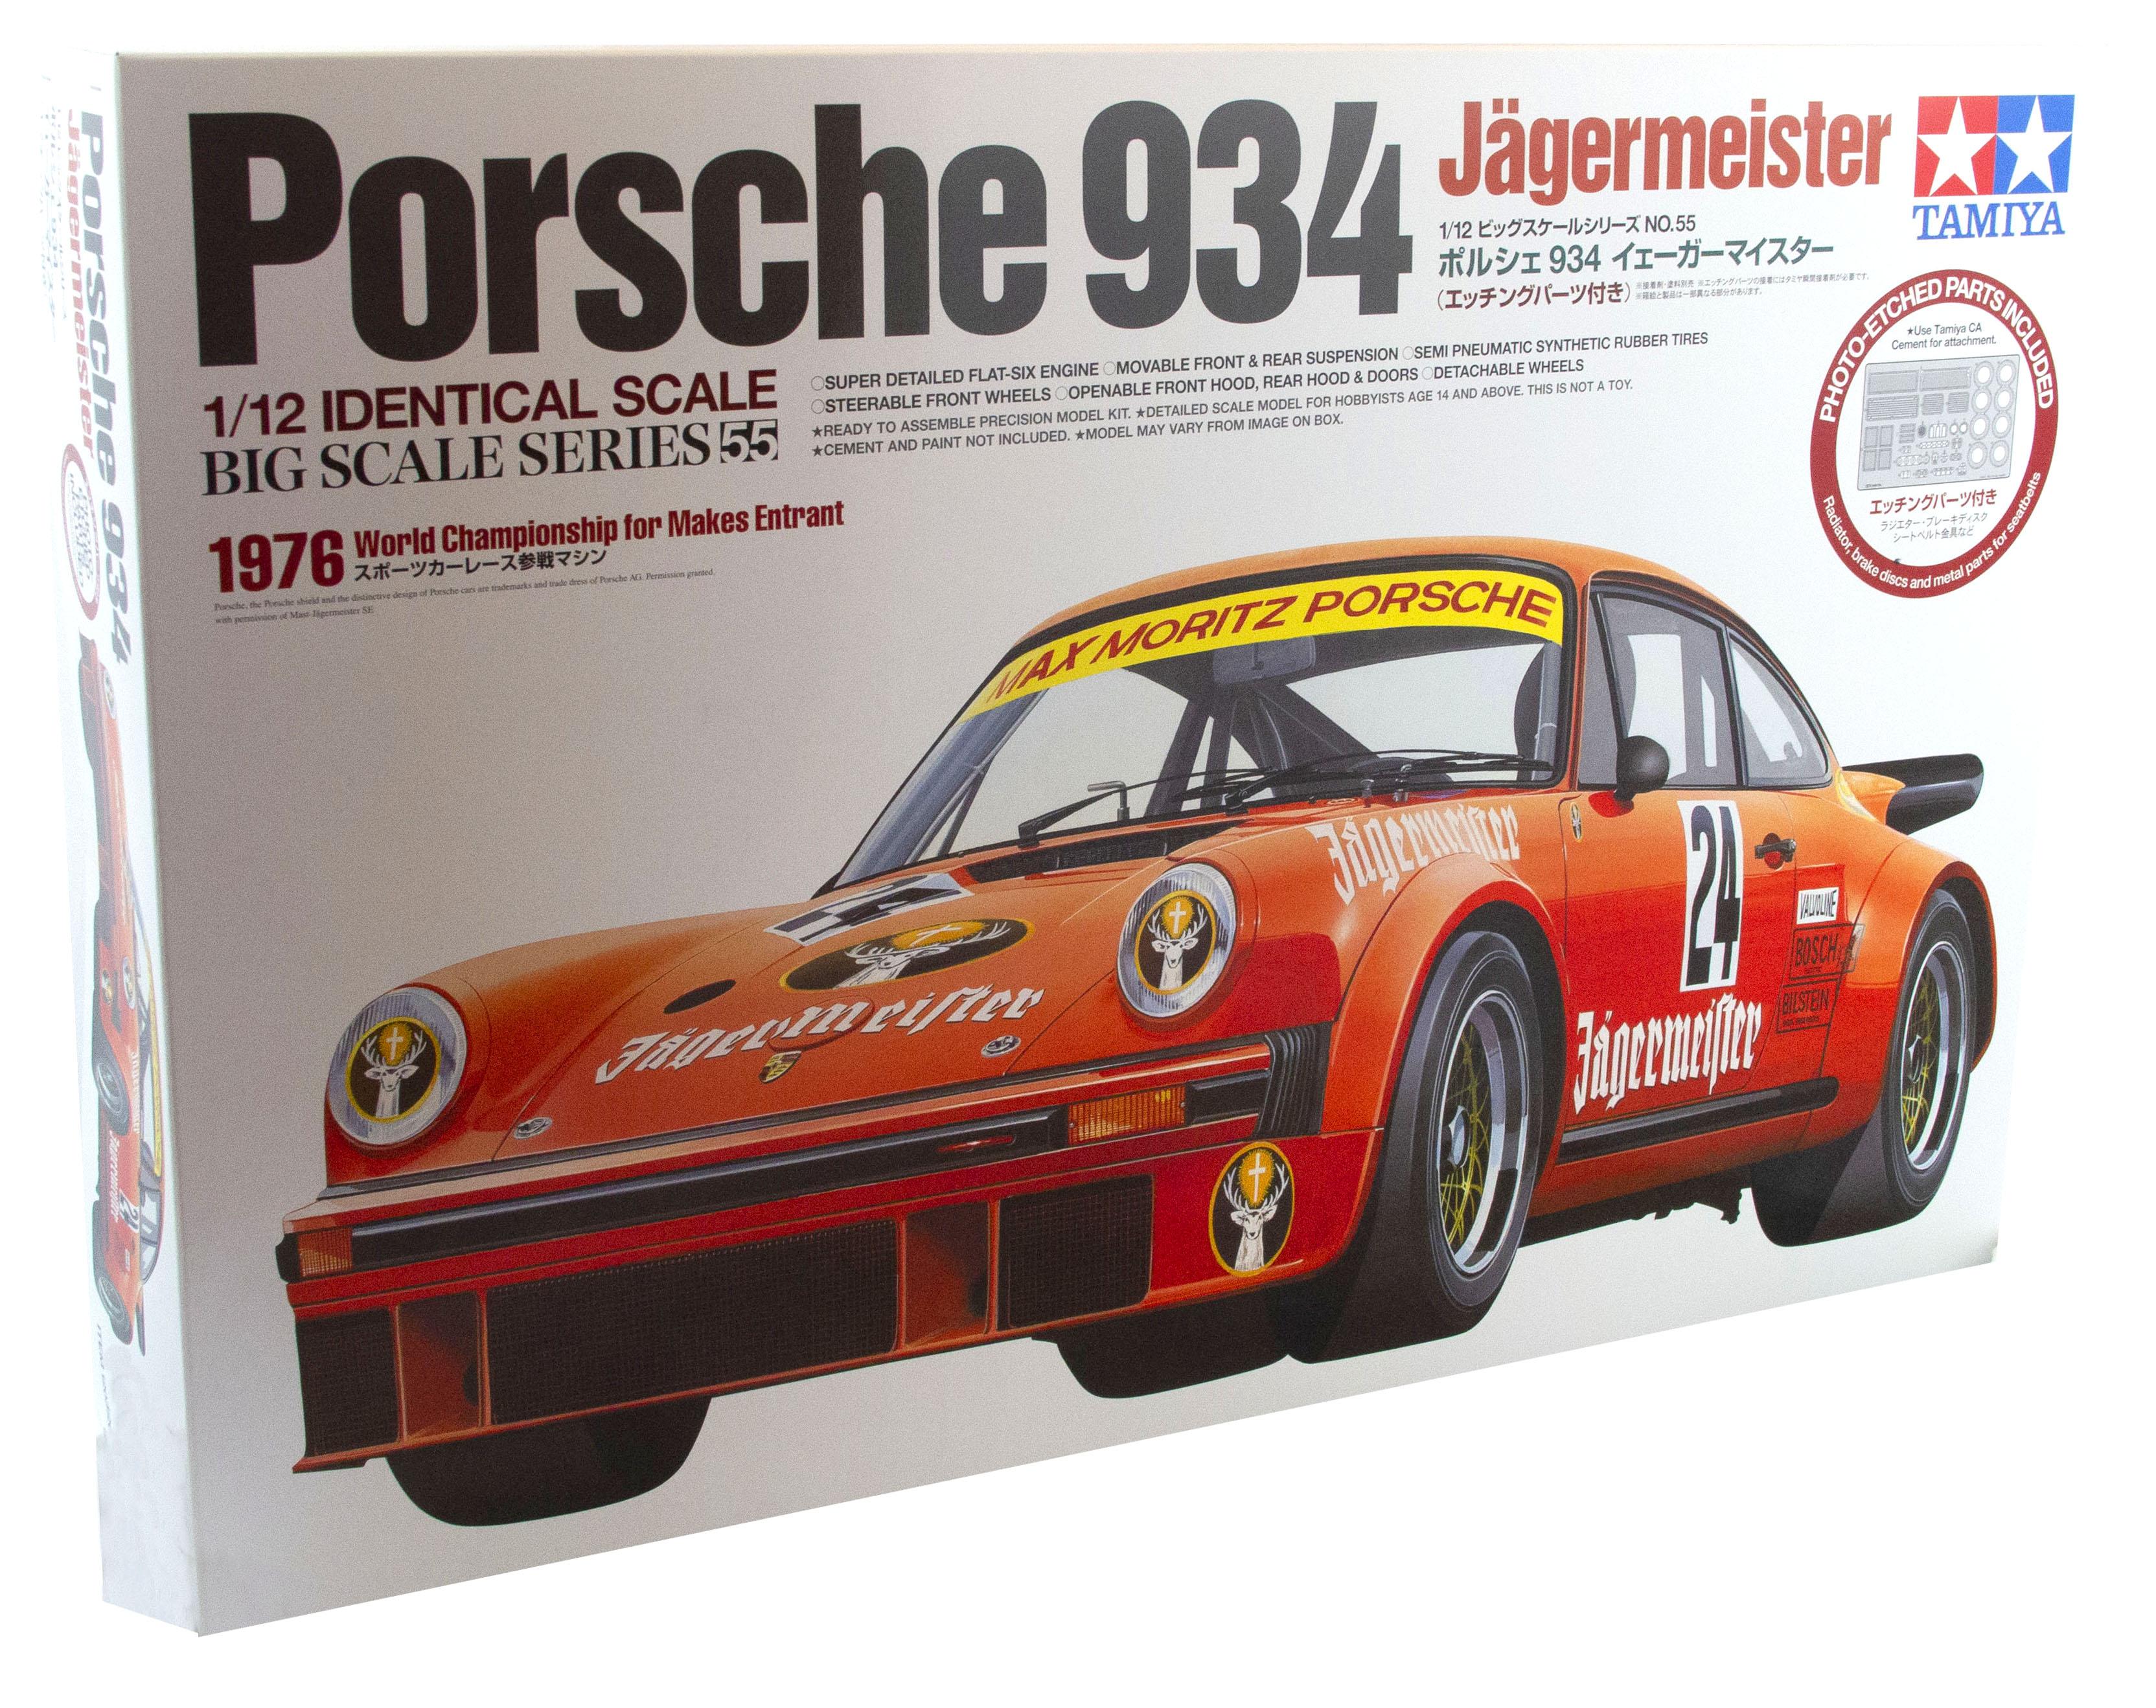 Kit Porsche 934 Jaegermeister 1976 World Championship For Makes Entrant 1/12